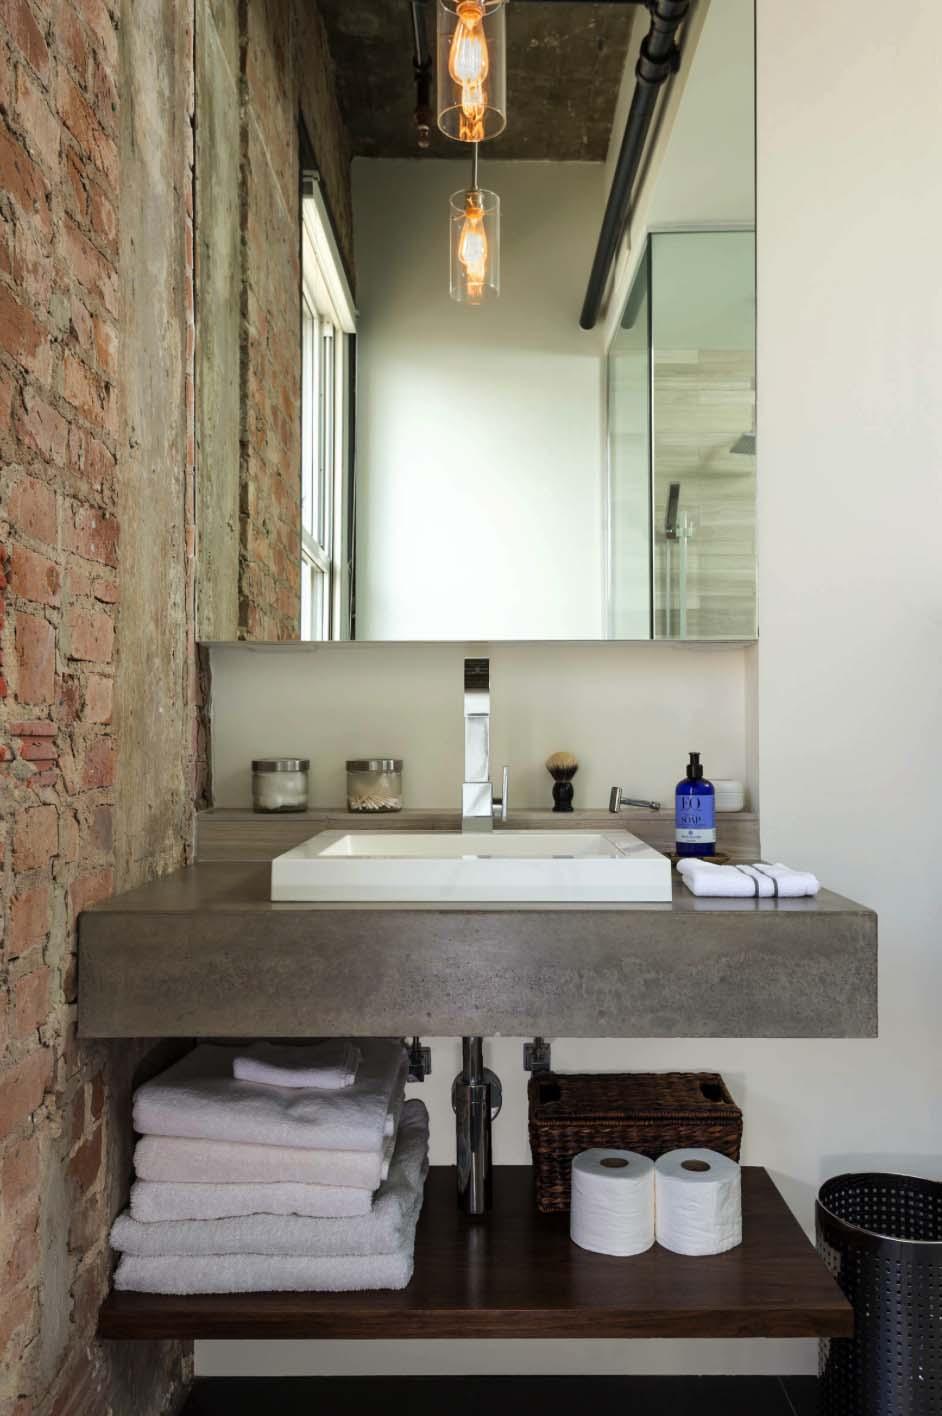 Ванная комната в стиле лофт с кирпичной стеной